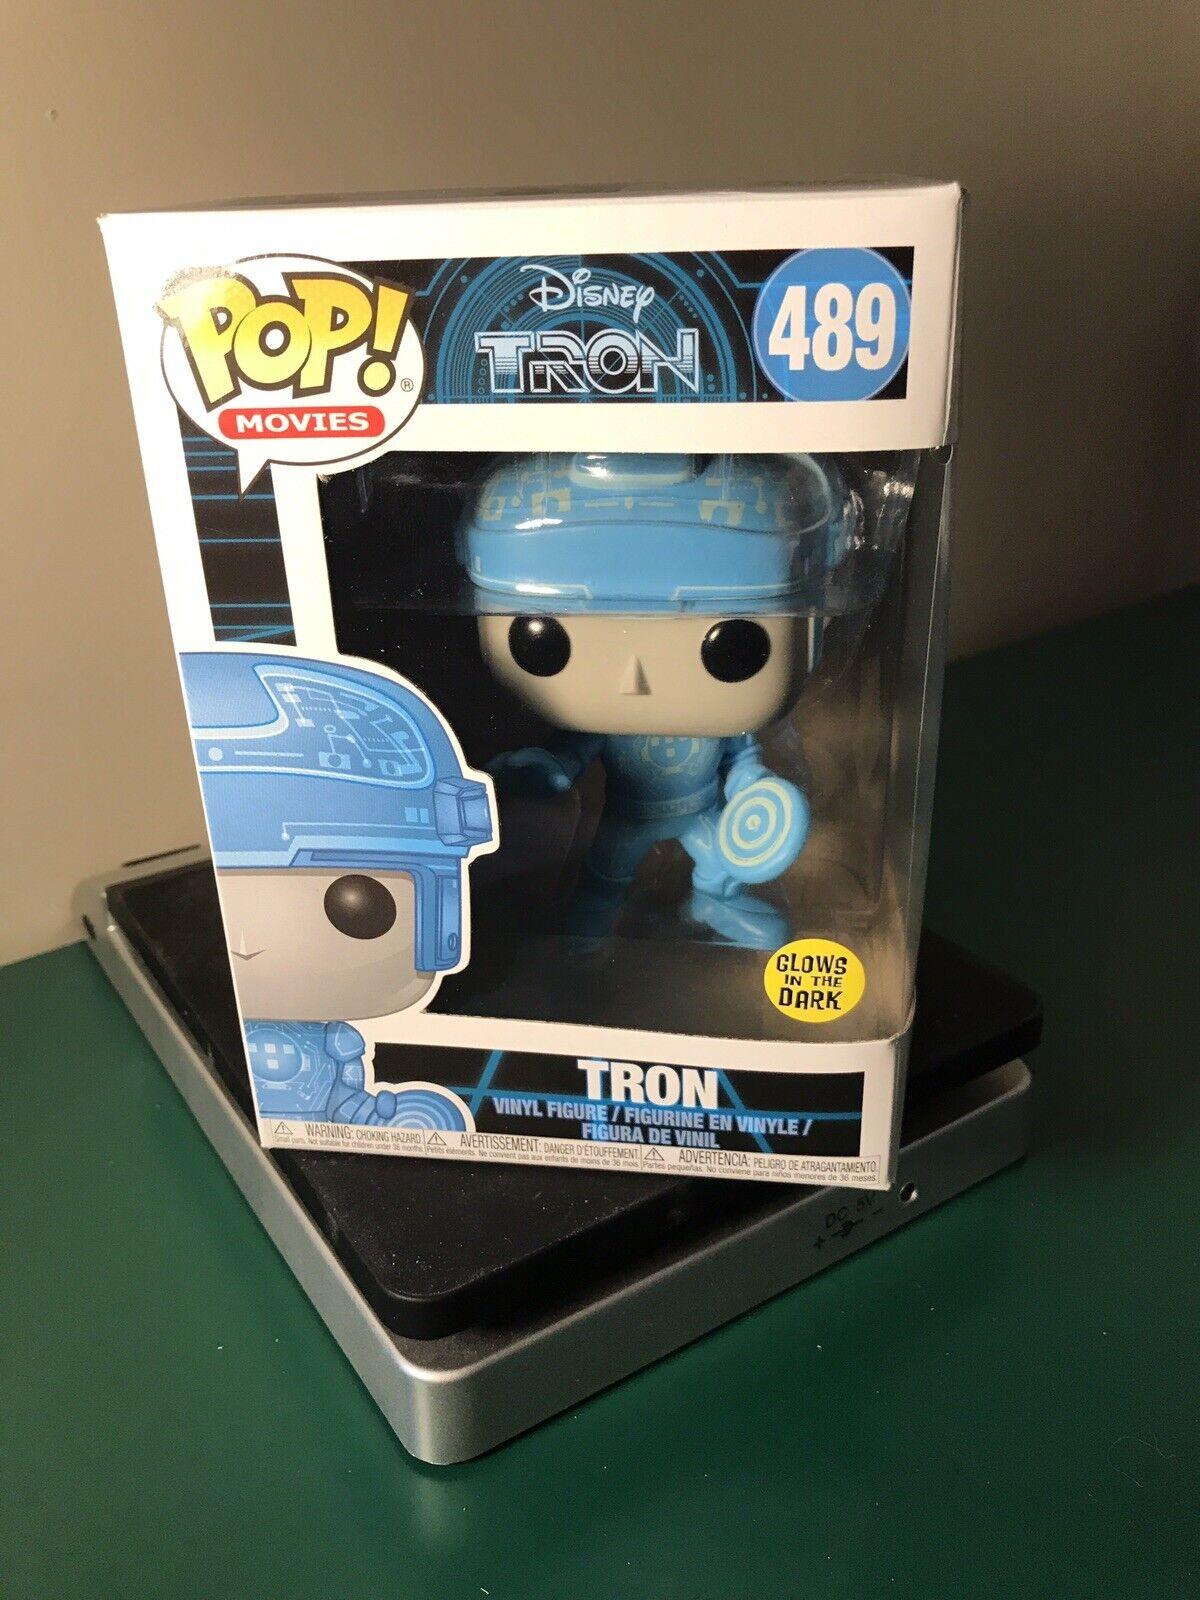 Tron Disney Glow In The Dark POP Movies #589 Vinyl Figure FUNKO